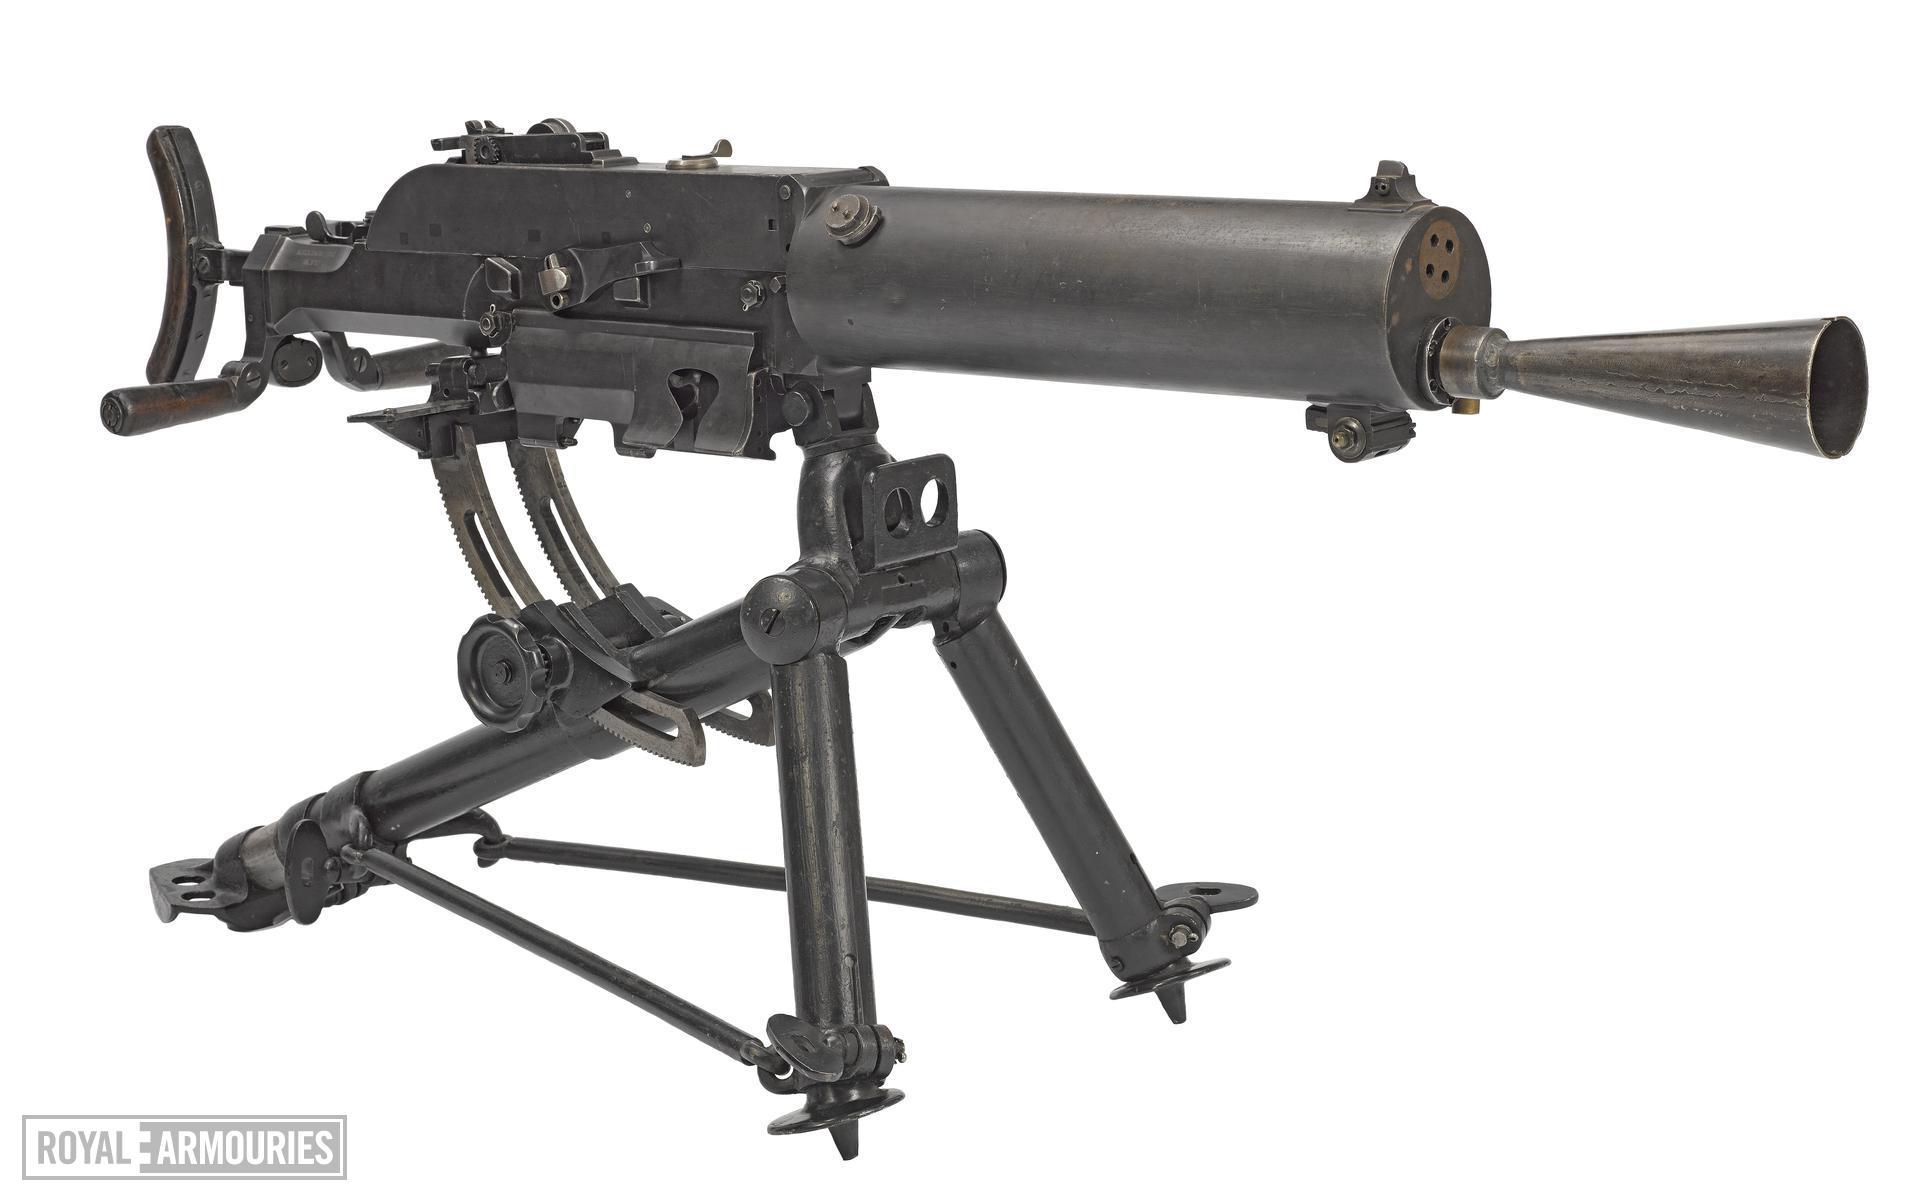 Schwarzlose Model 7/12 centrefire automatic belf fed machine gun, Austria, about 1914